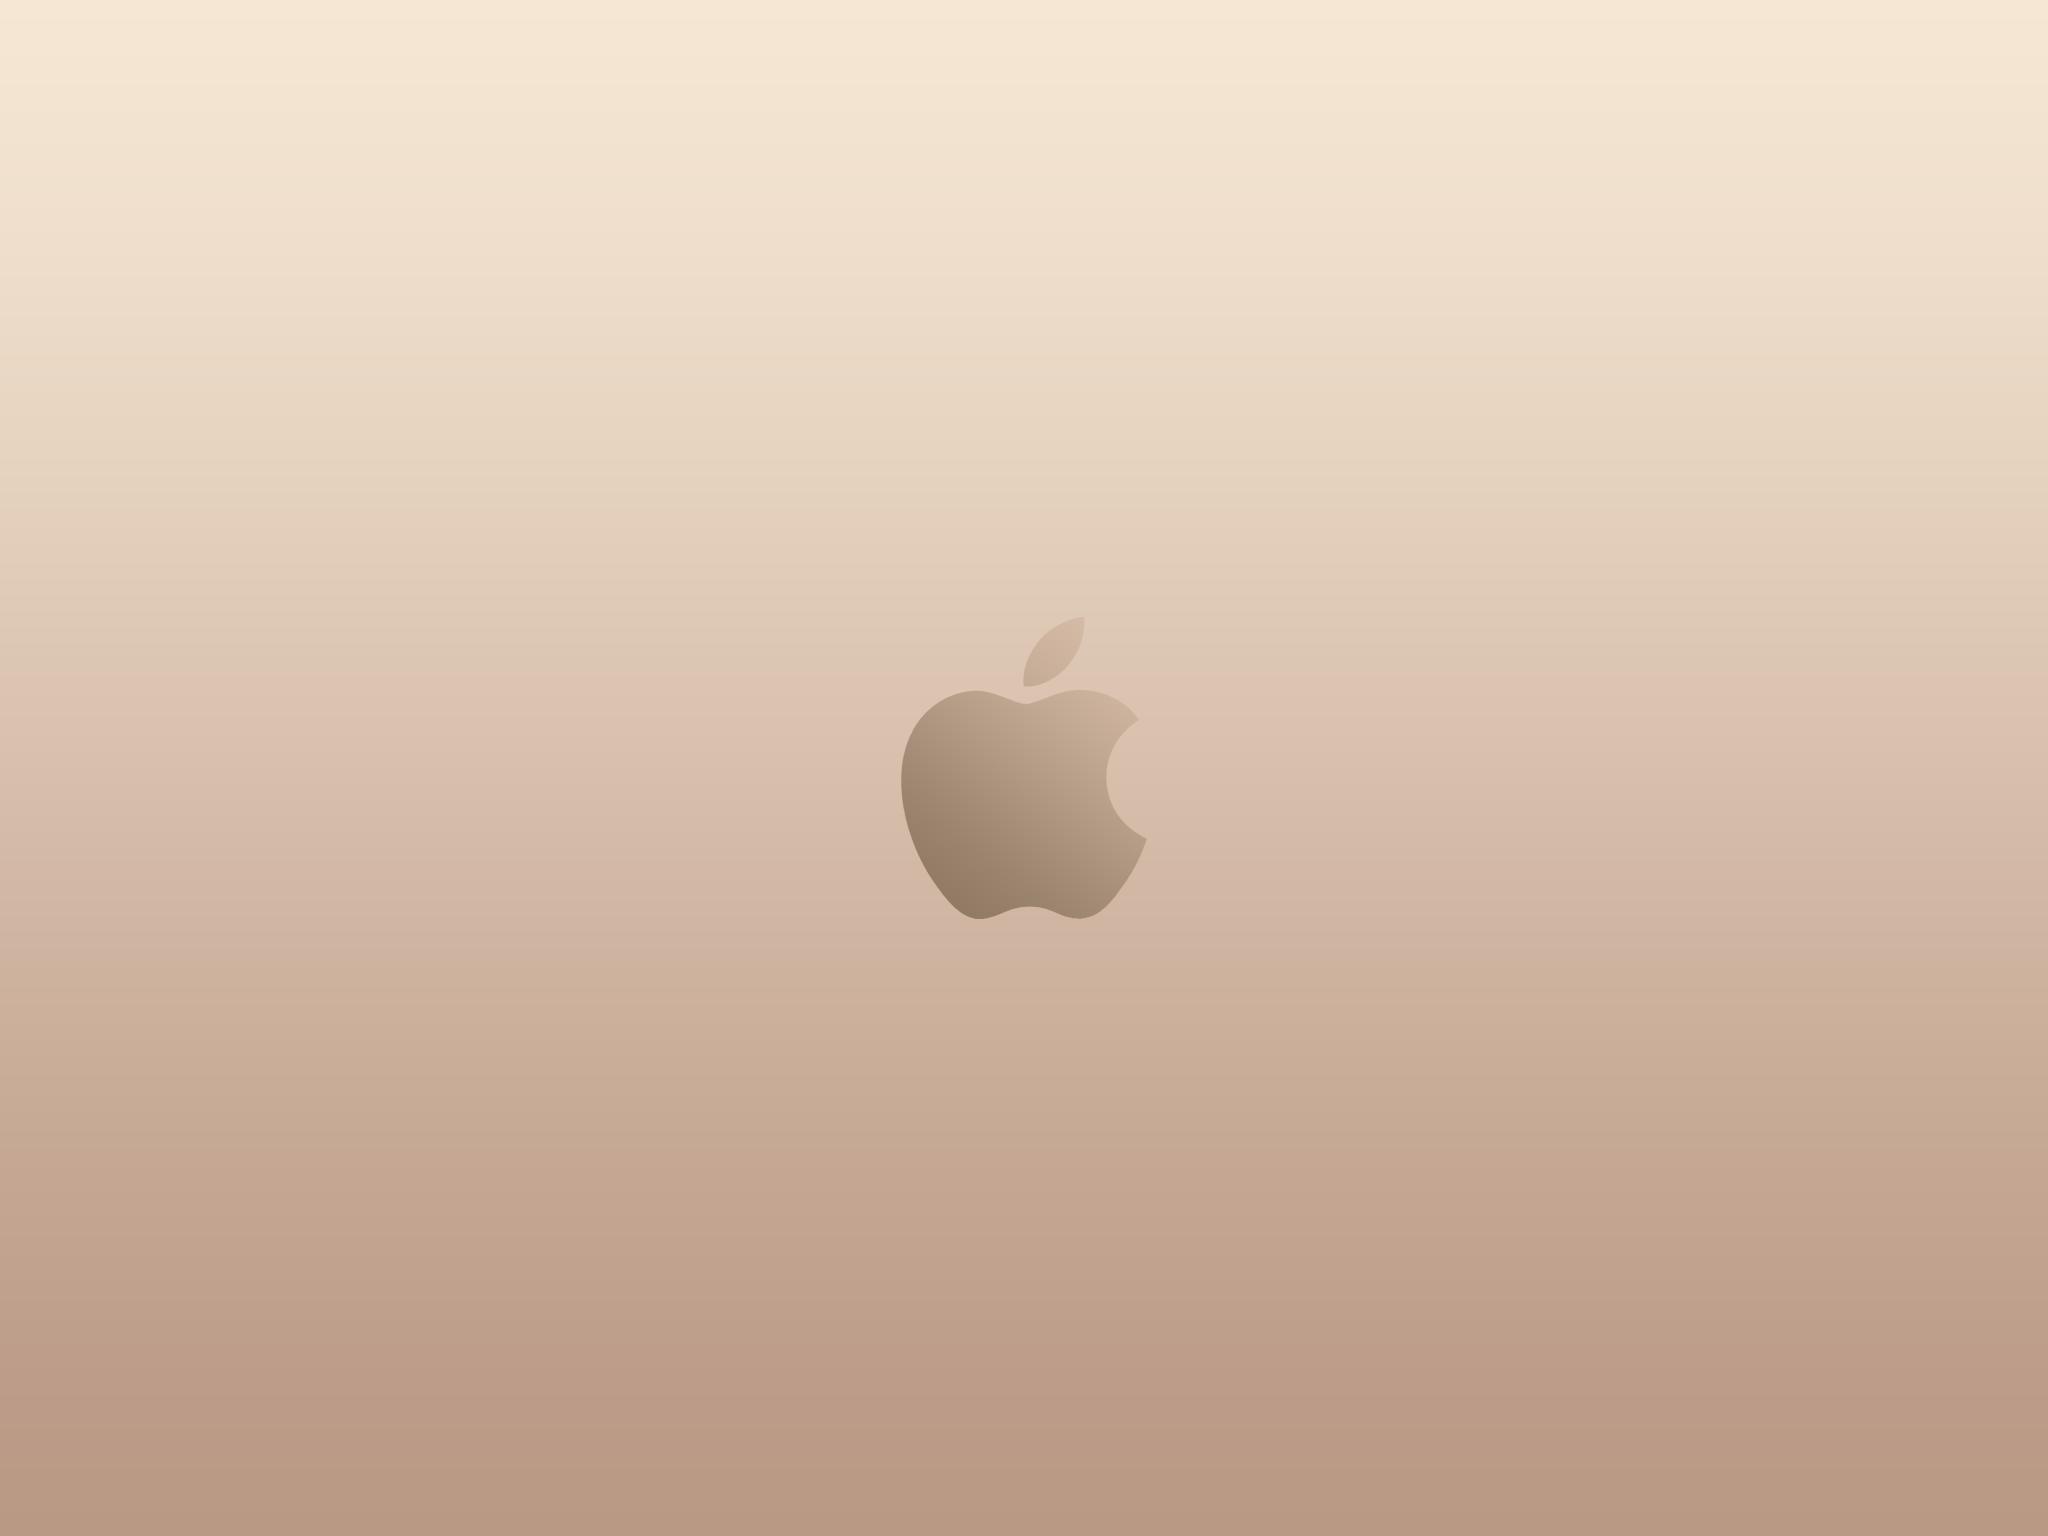 Apple Logo Gold Wallpaper